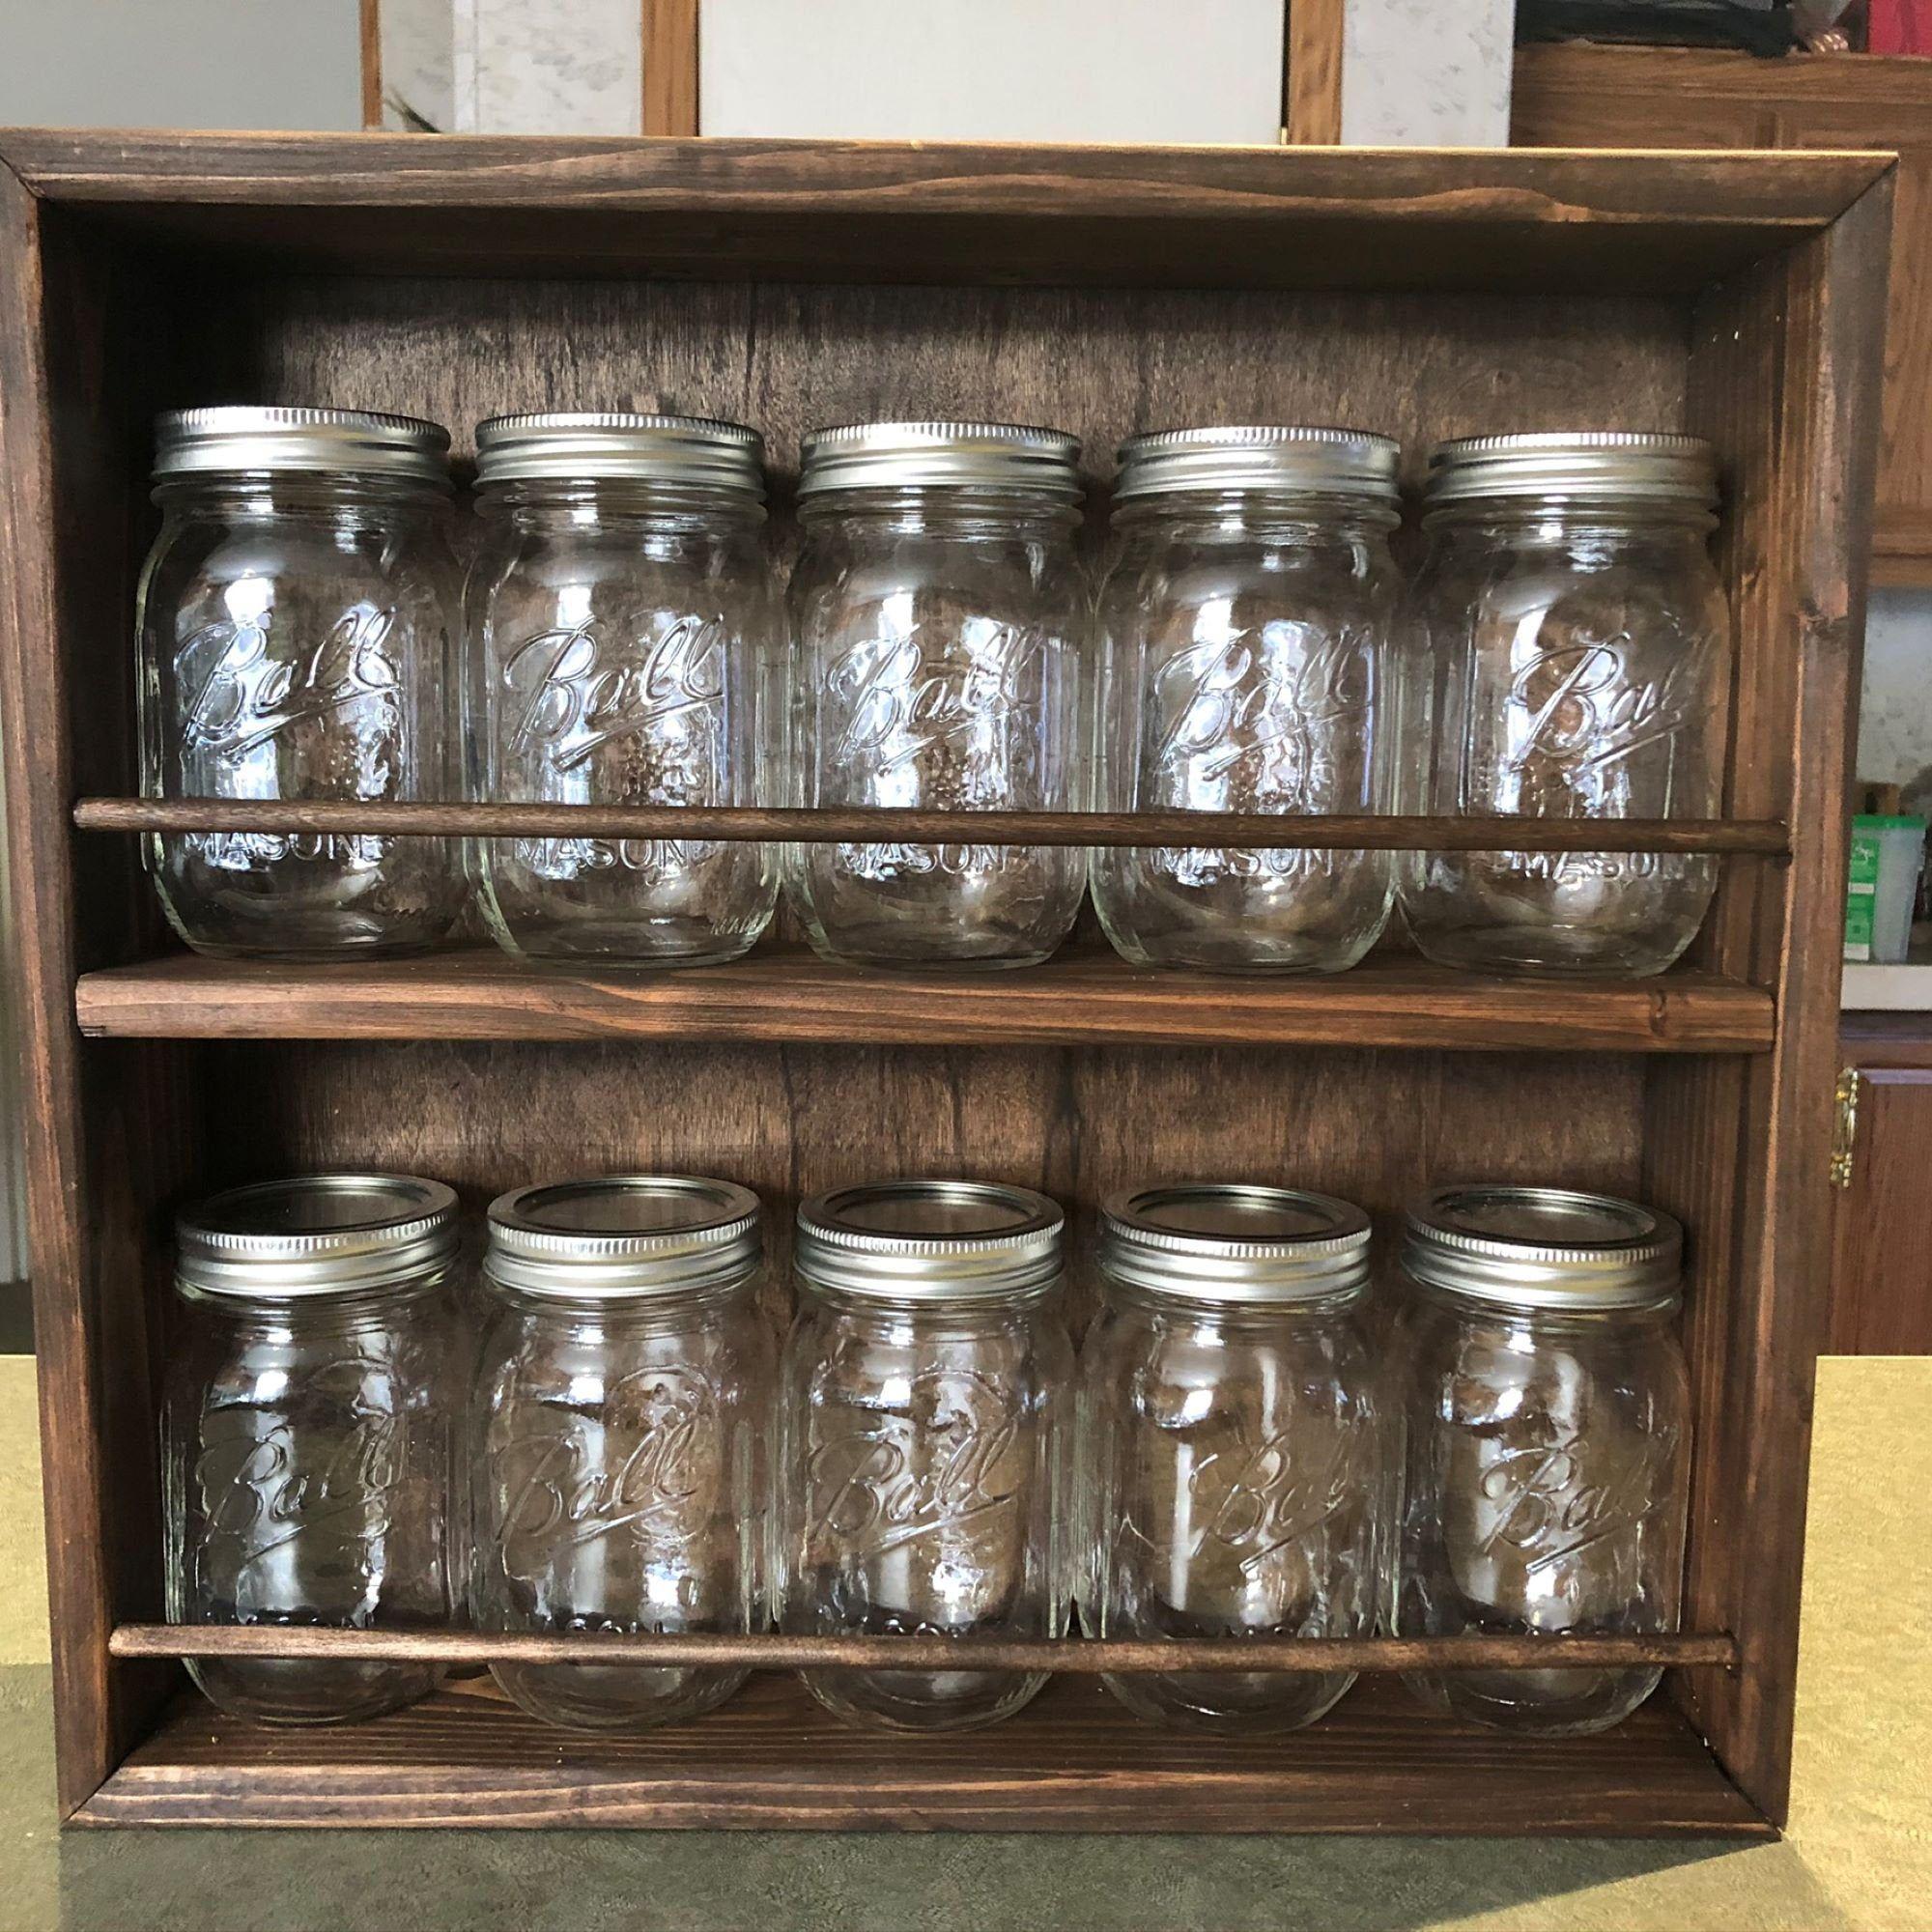 10 Jar Spice Rack 16oz Mason Jar Spice Rack Spice Jar Rack Etsy In 2020 Mason Jar Shelf Mason Jar Storage Mason Jar Kitchen